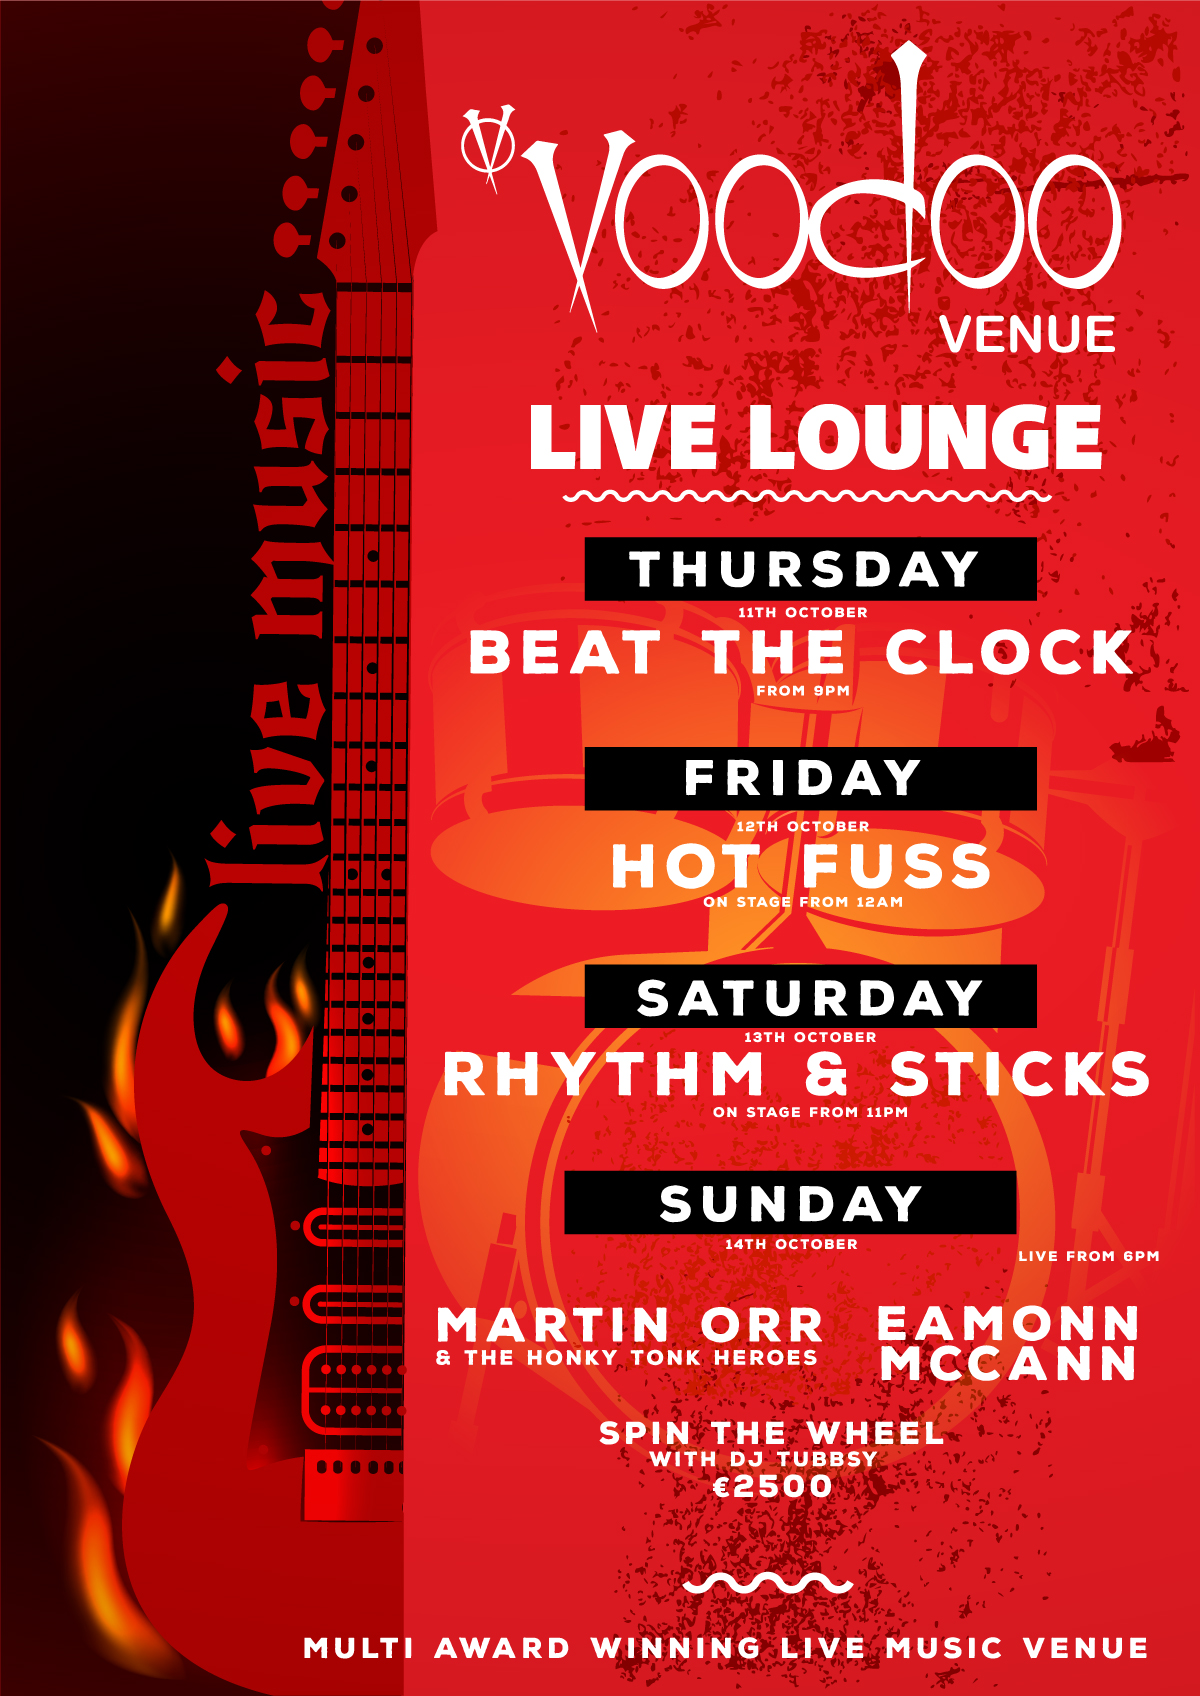 voodoo-venue---live-lounge---thurs-11---sun-14-2018.jpg